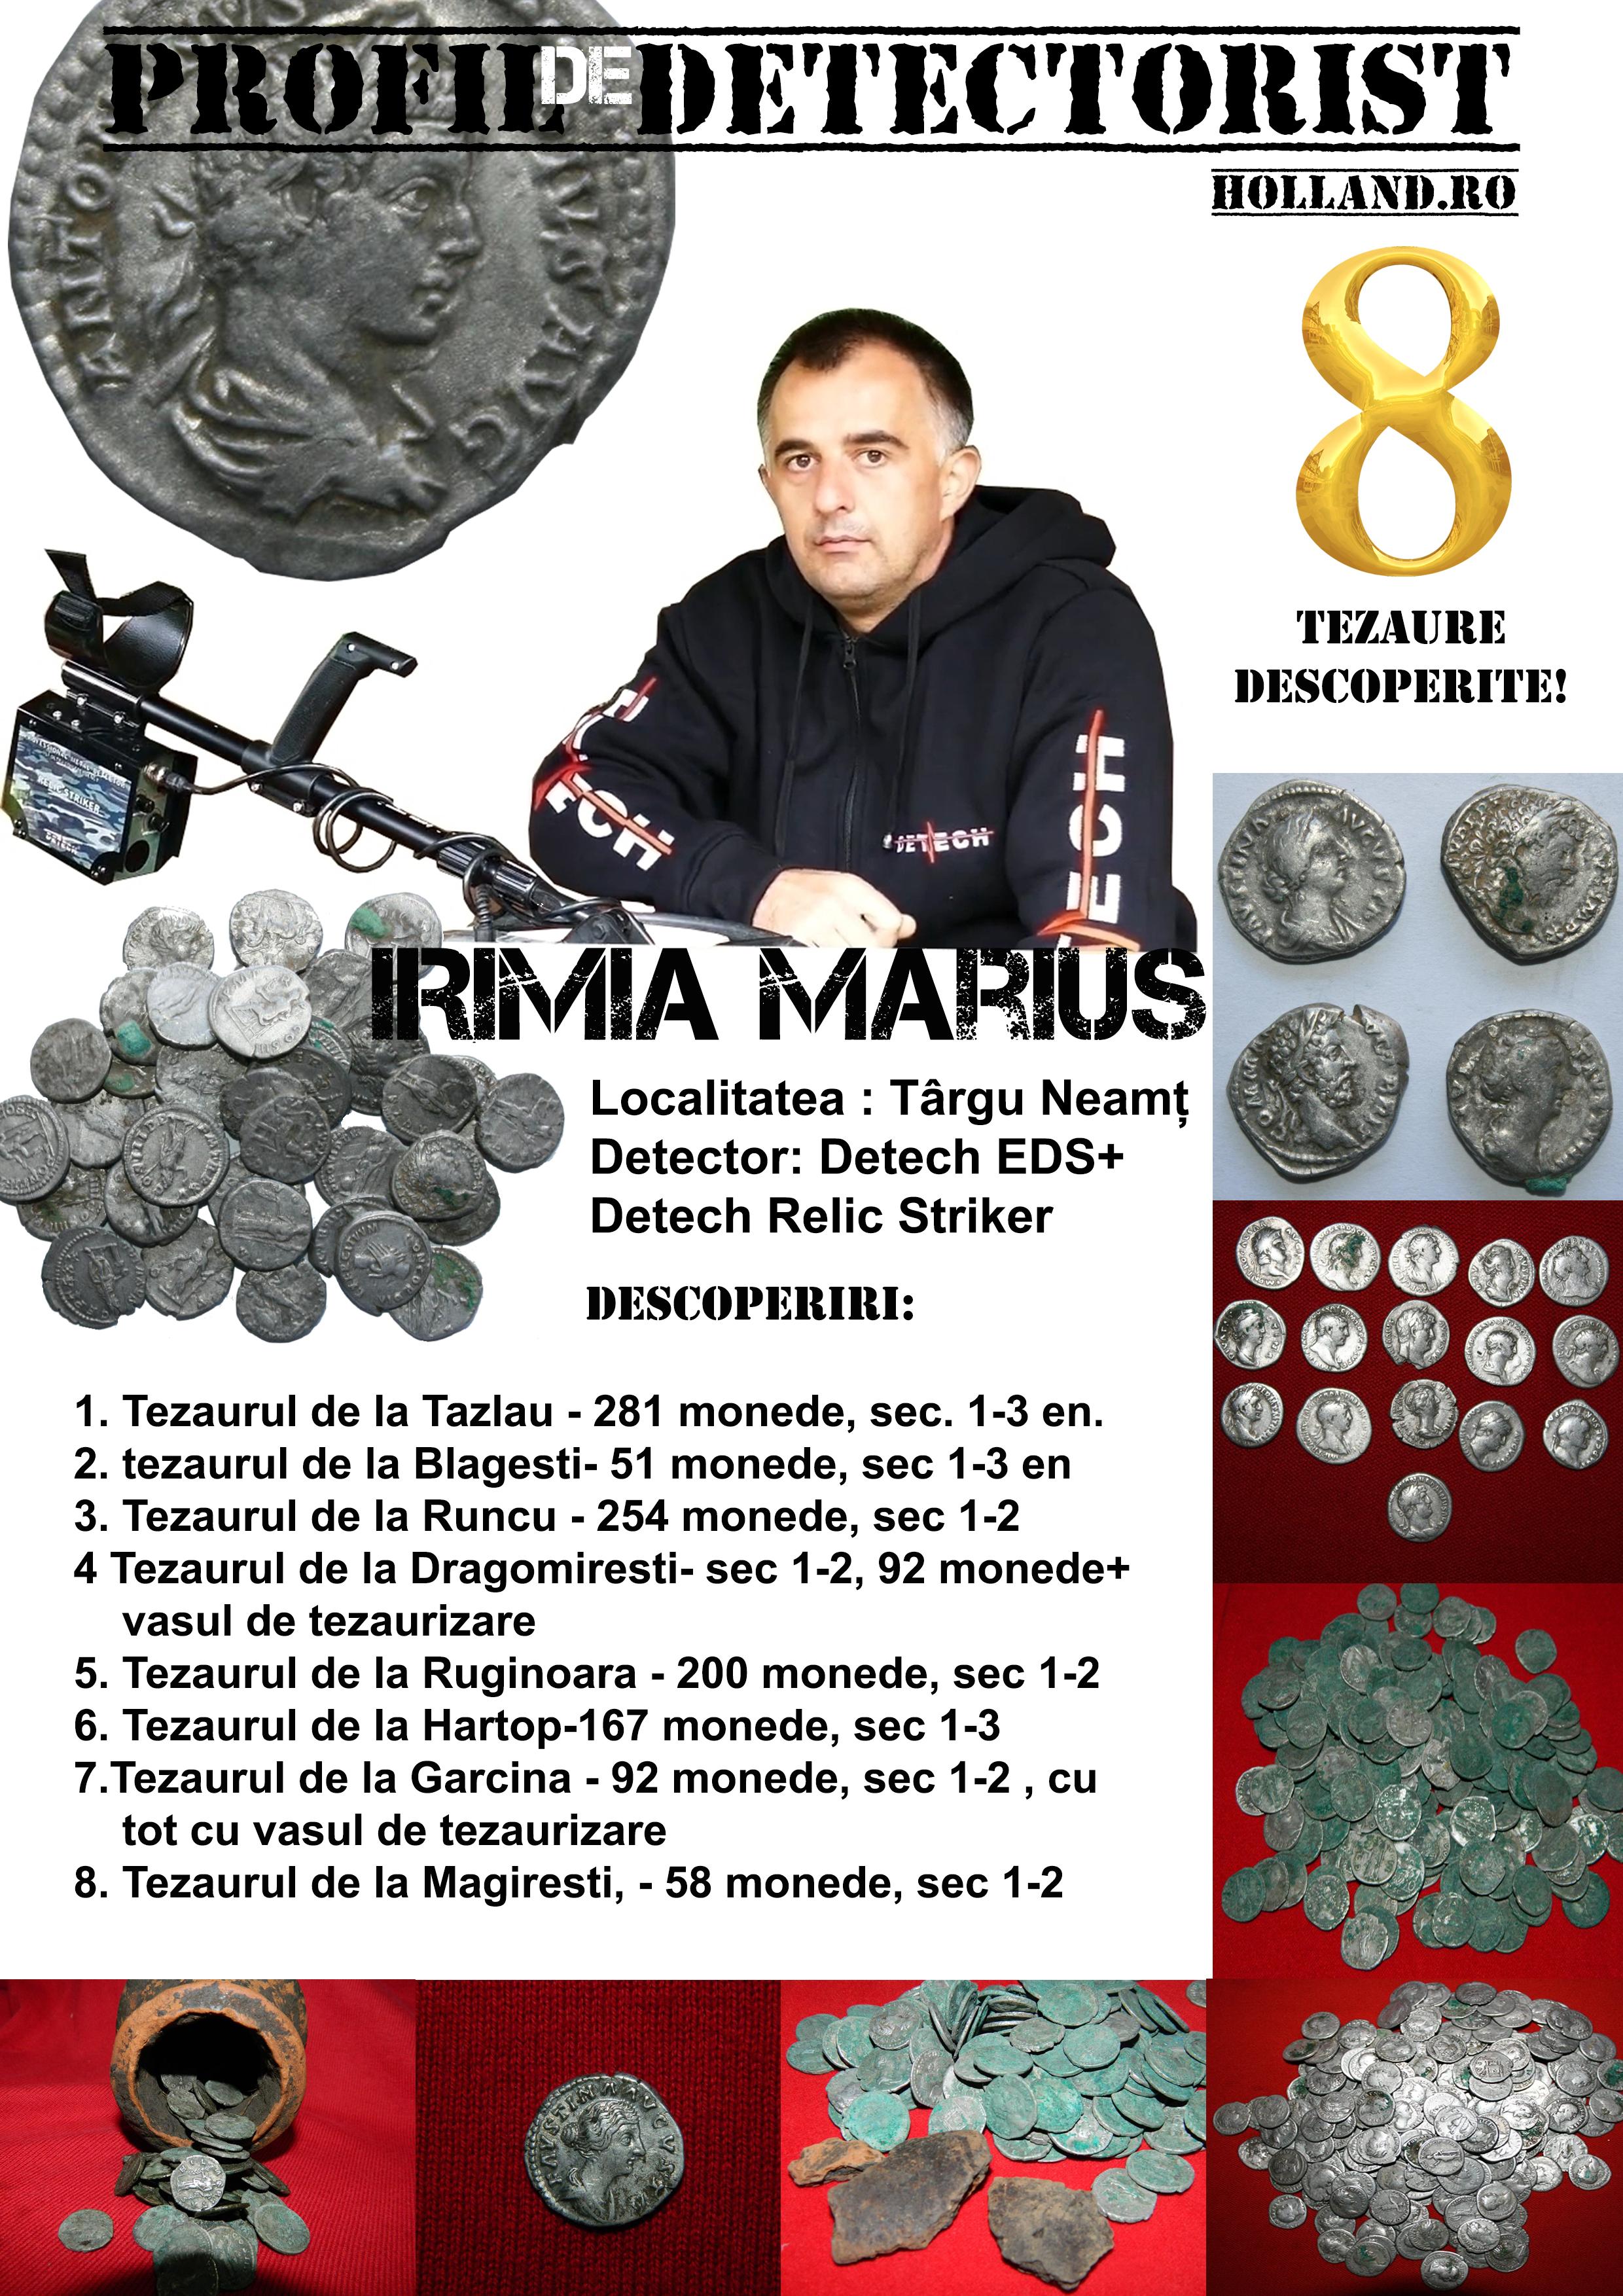 Profil de detectorist – Irimia Marius omul cu 8 tezaure descoperite